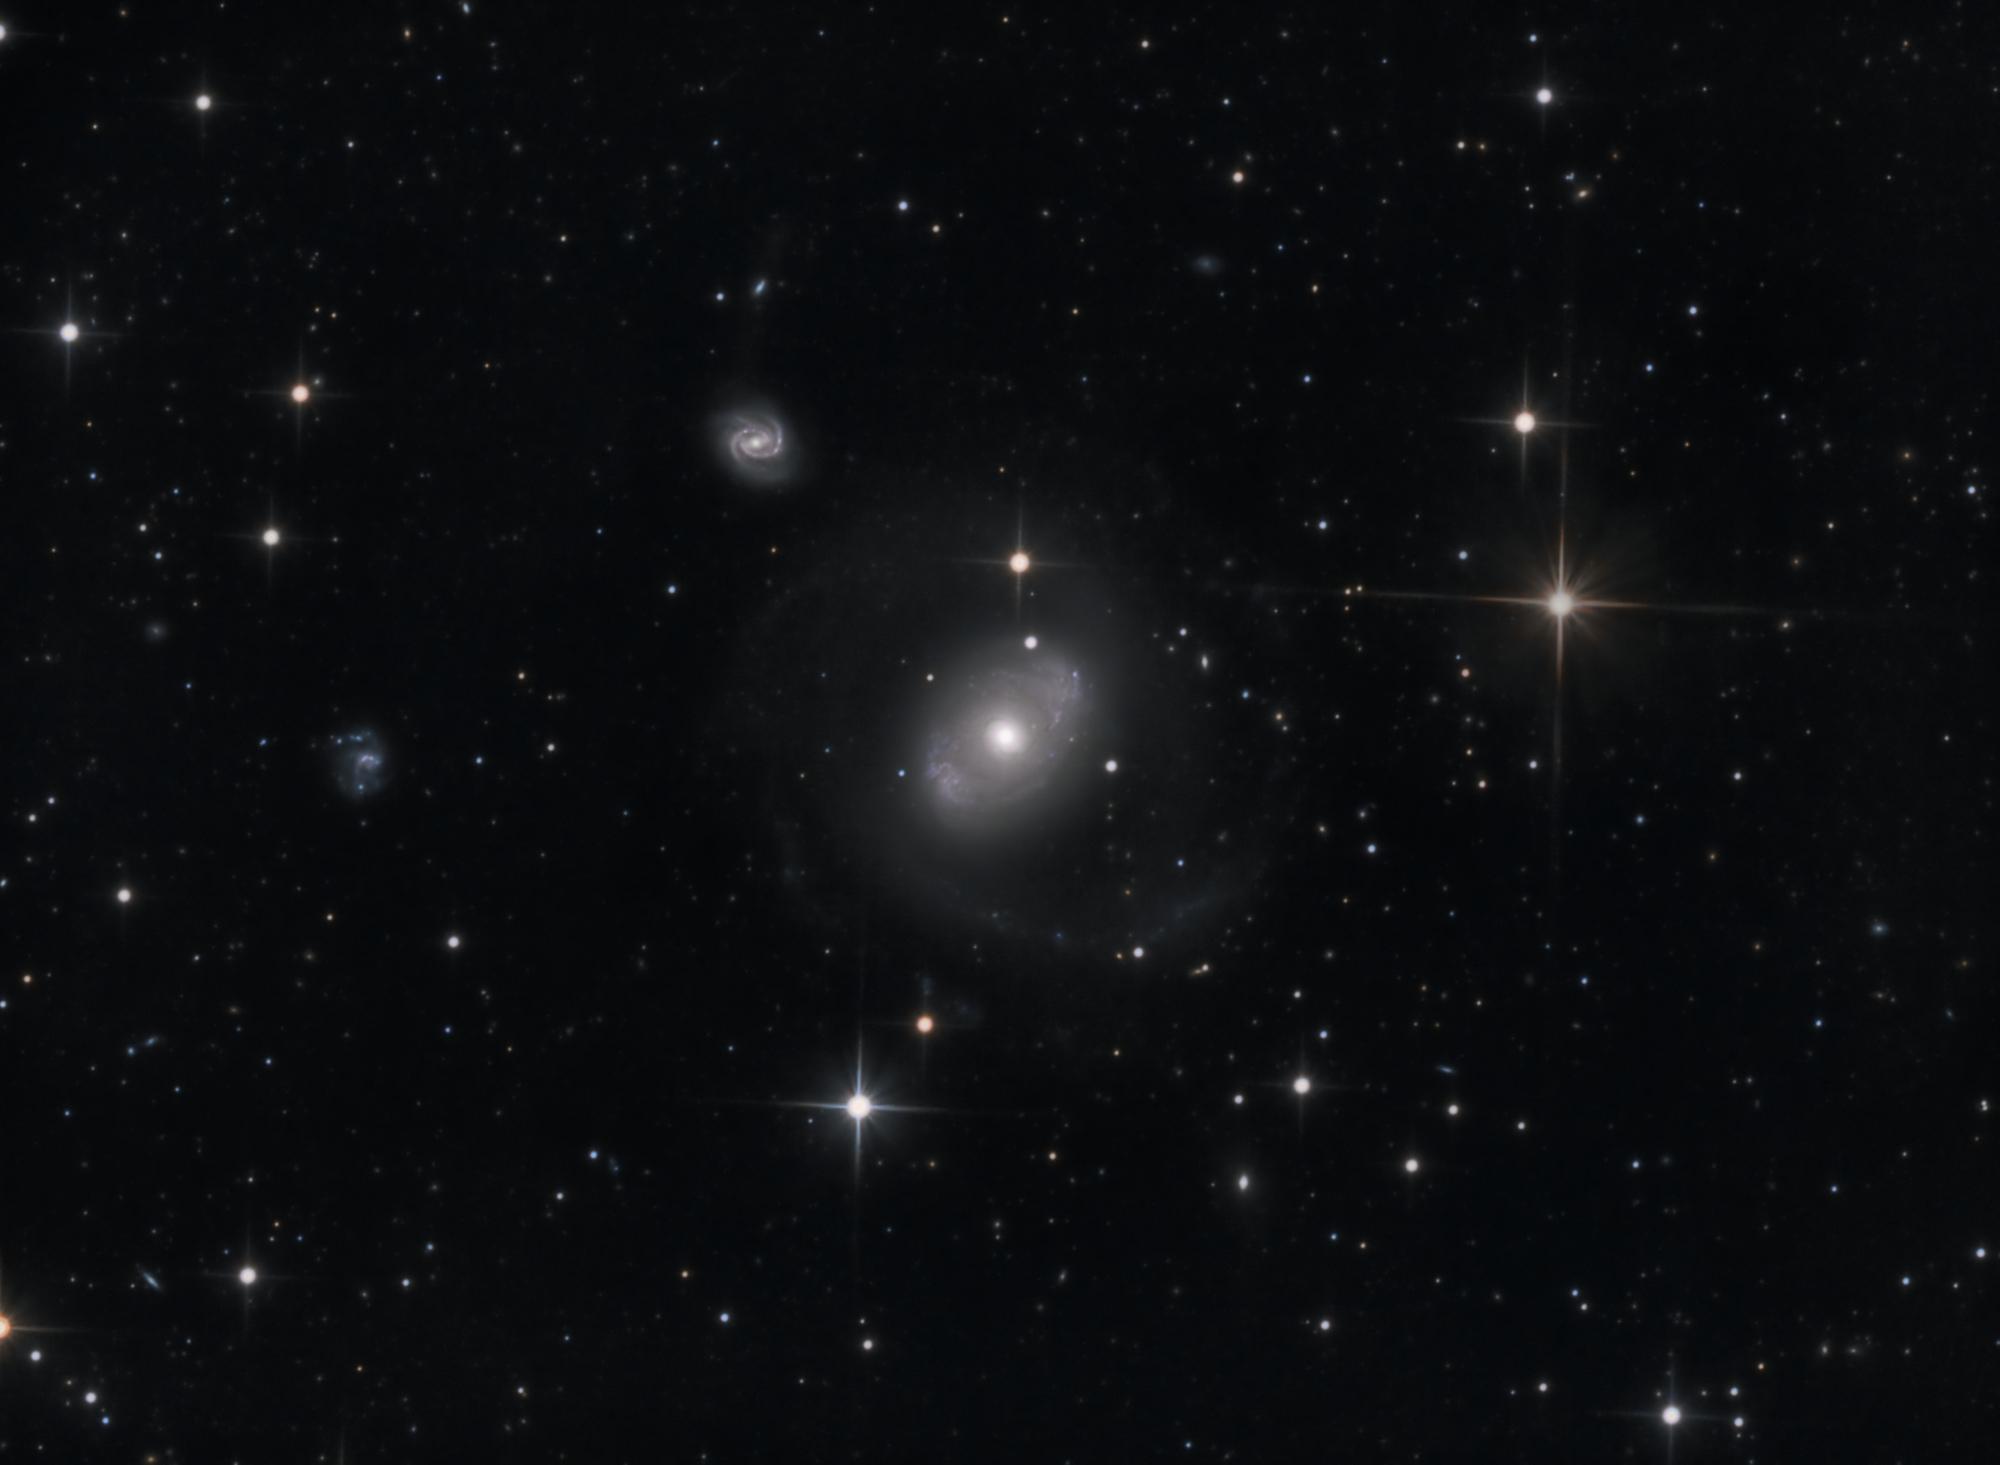 NGC_4151_LRGB.thumb.jpg.96bc823557fd12c14fe2cdb7939252a9.jpg